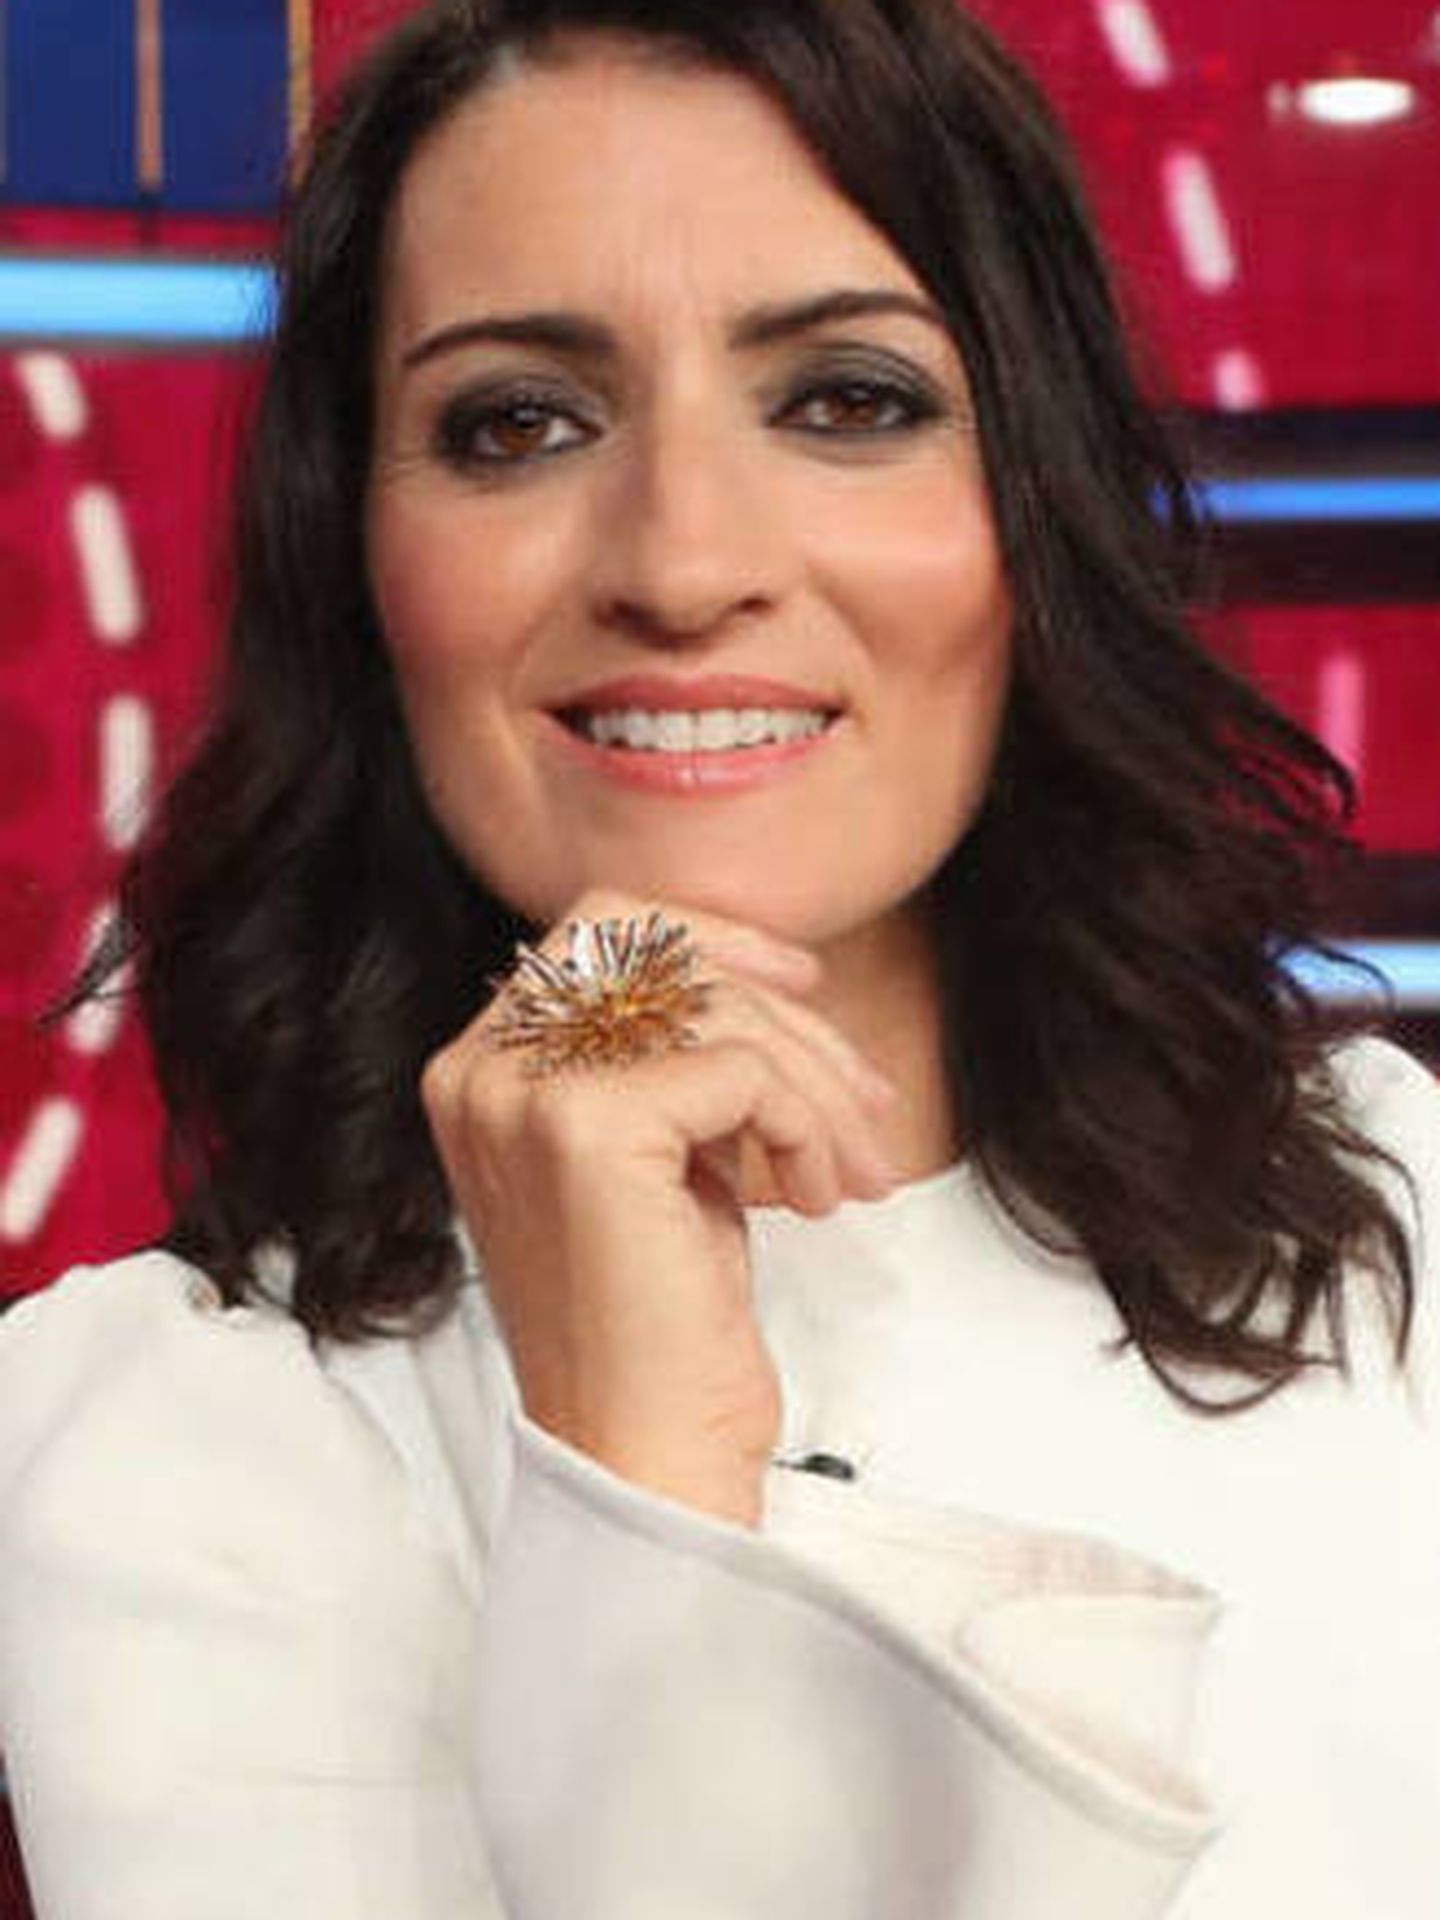 Silvia Abril en el plató de 'Tú si que sí'. (Atresmedia TV)